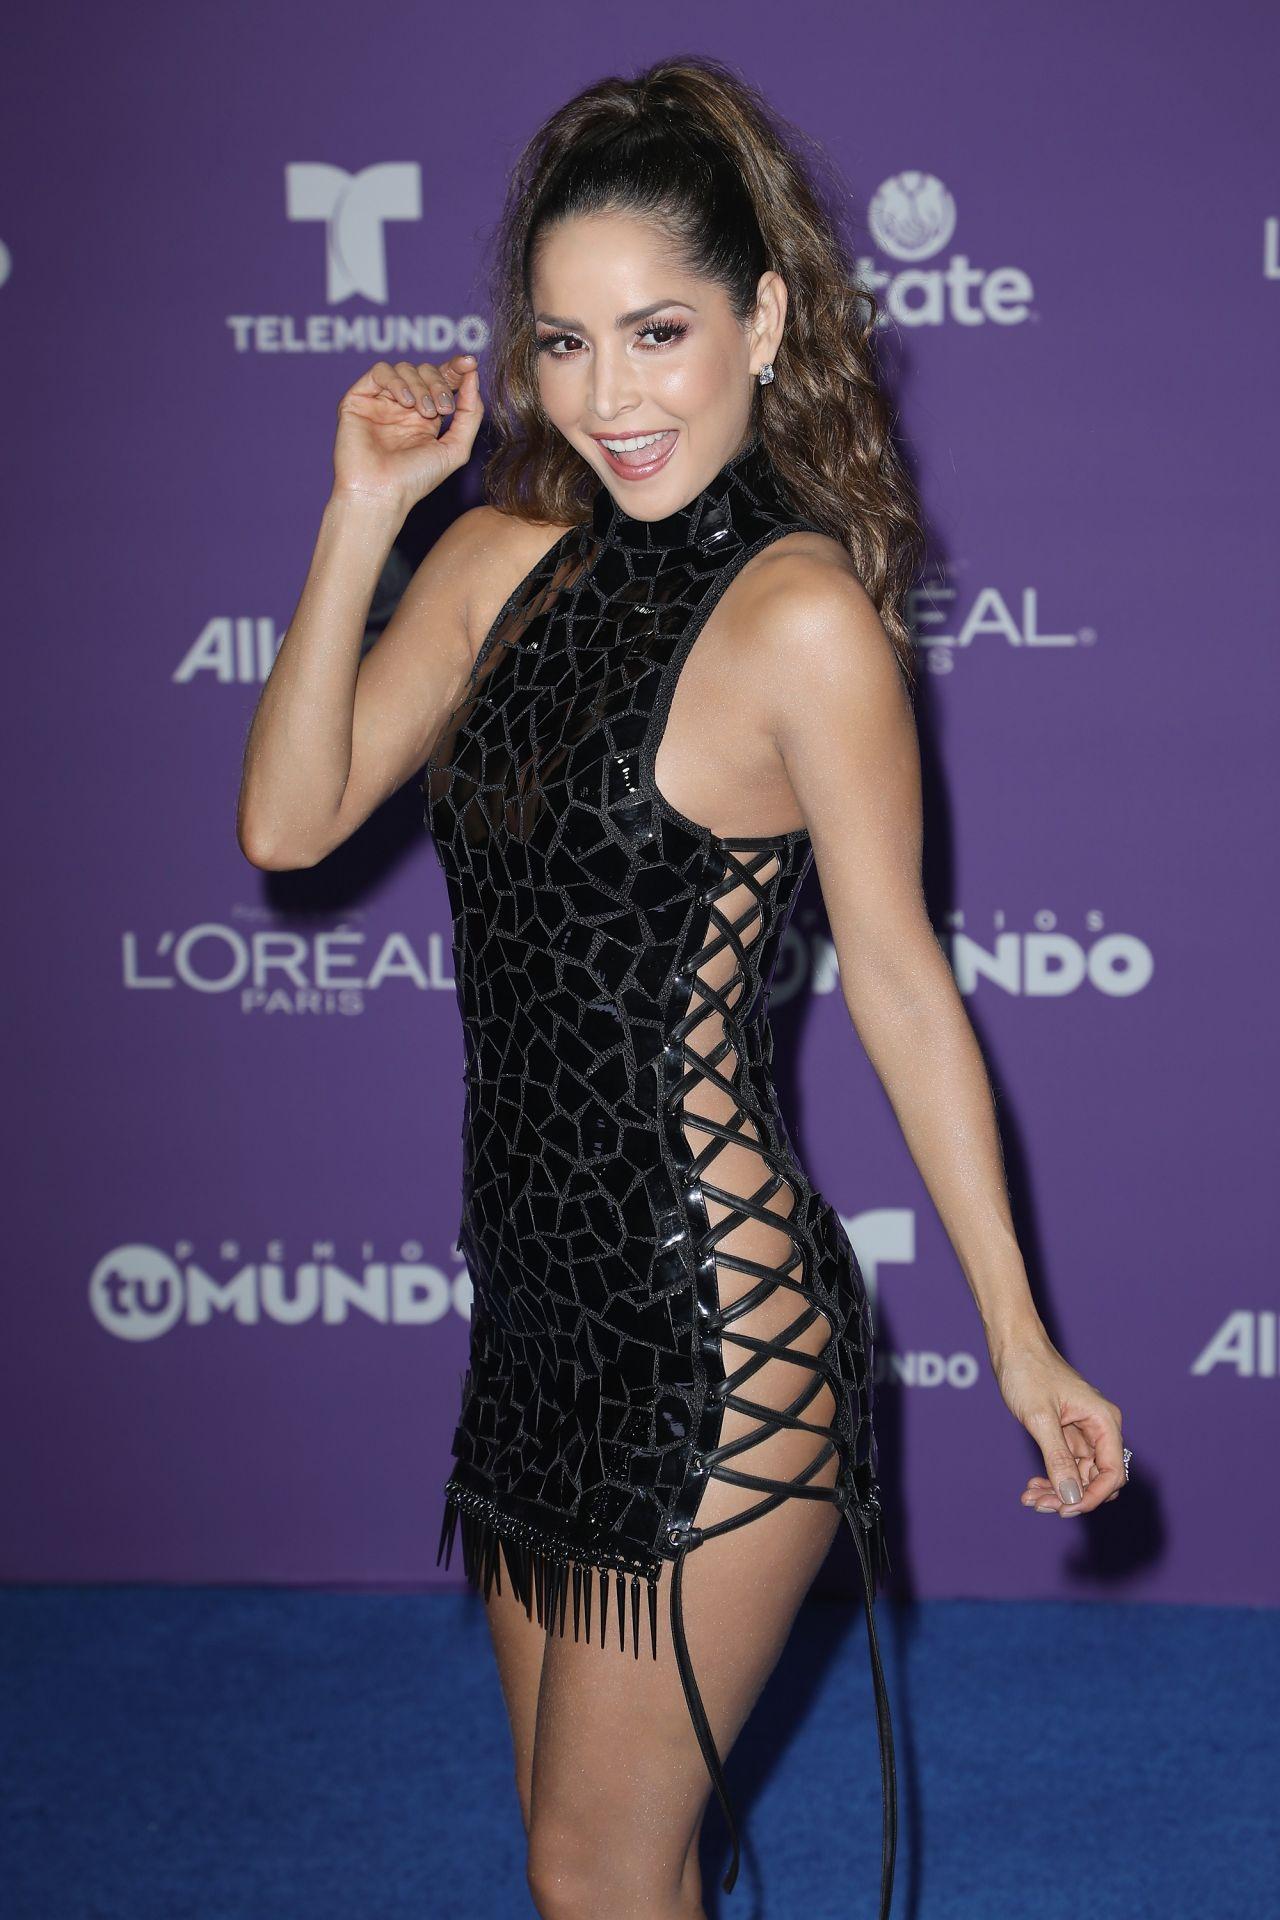 Carmen Villalobos Premios Tu Mundo In Miami 08 24 2017